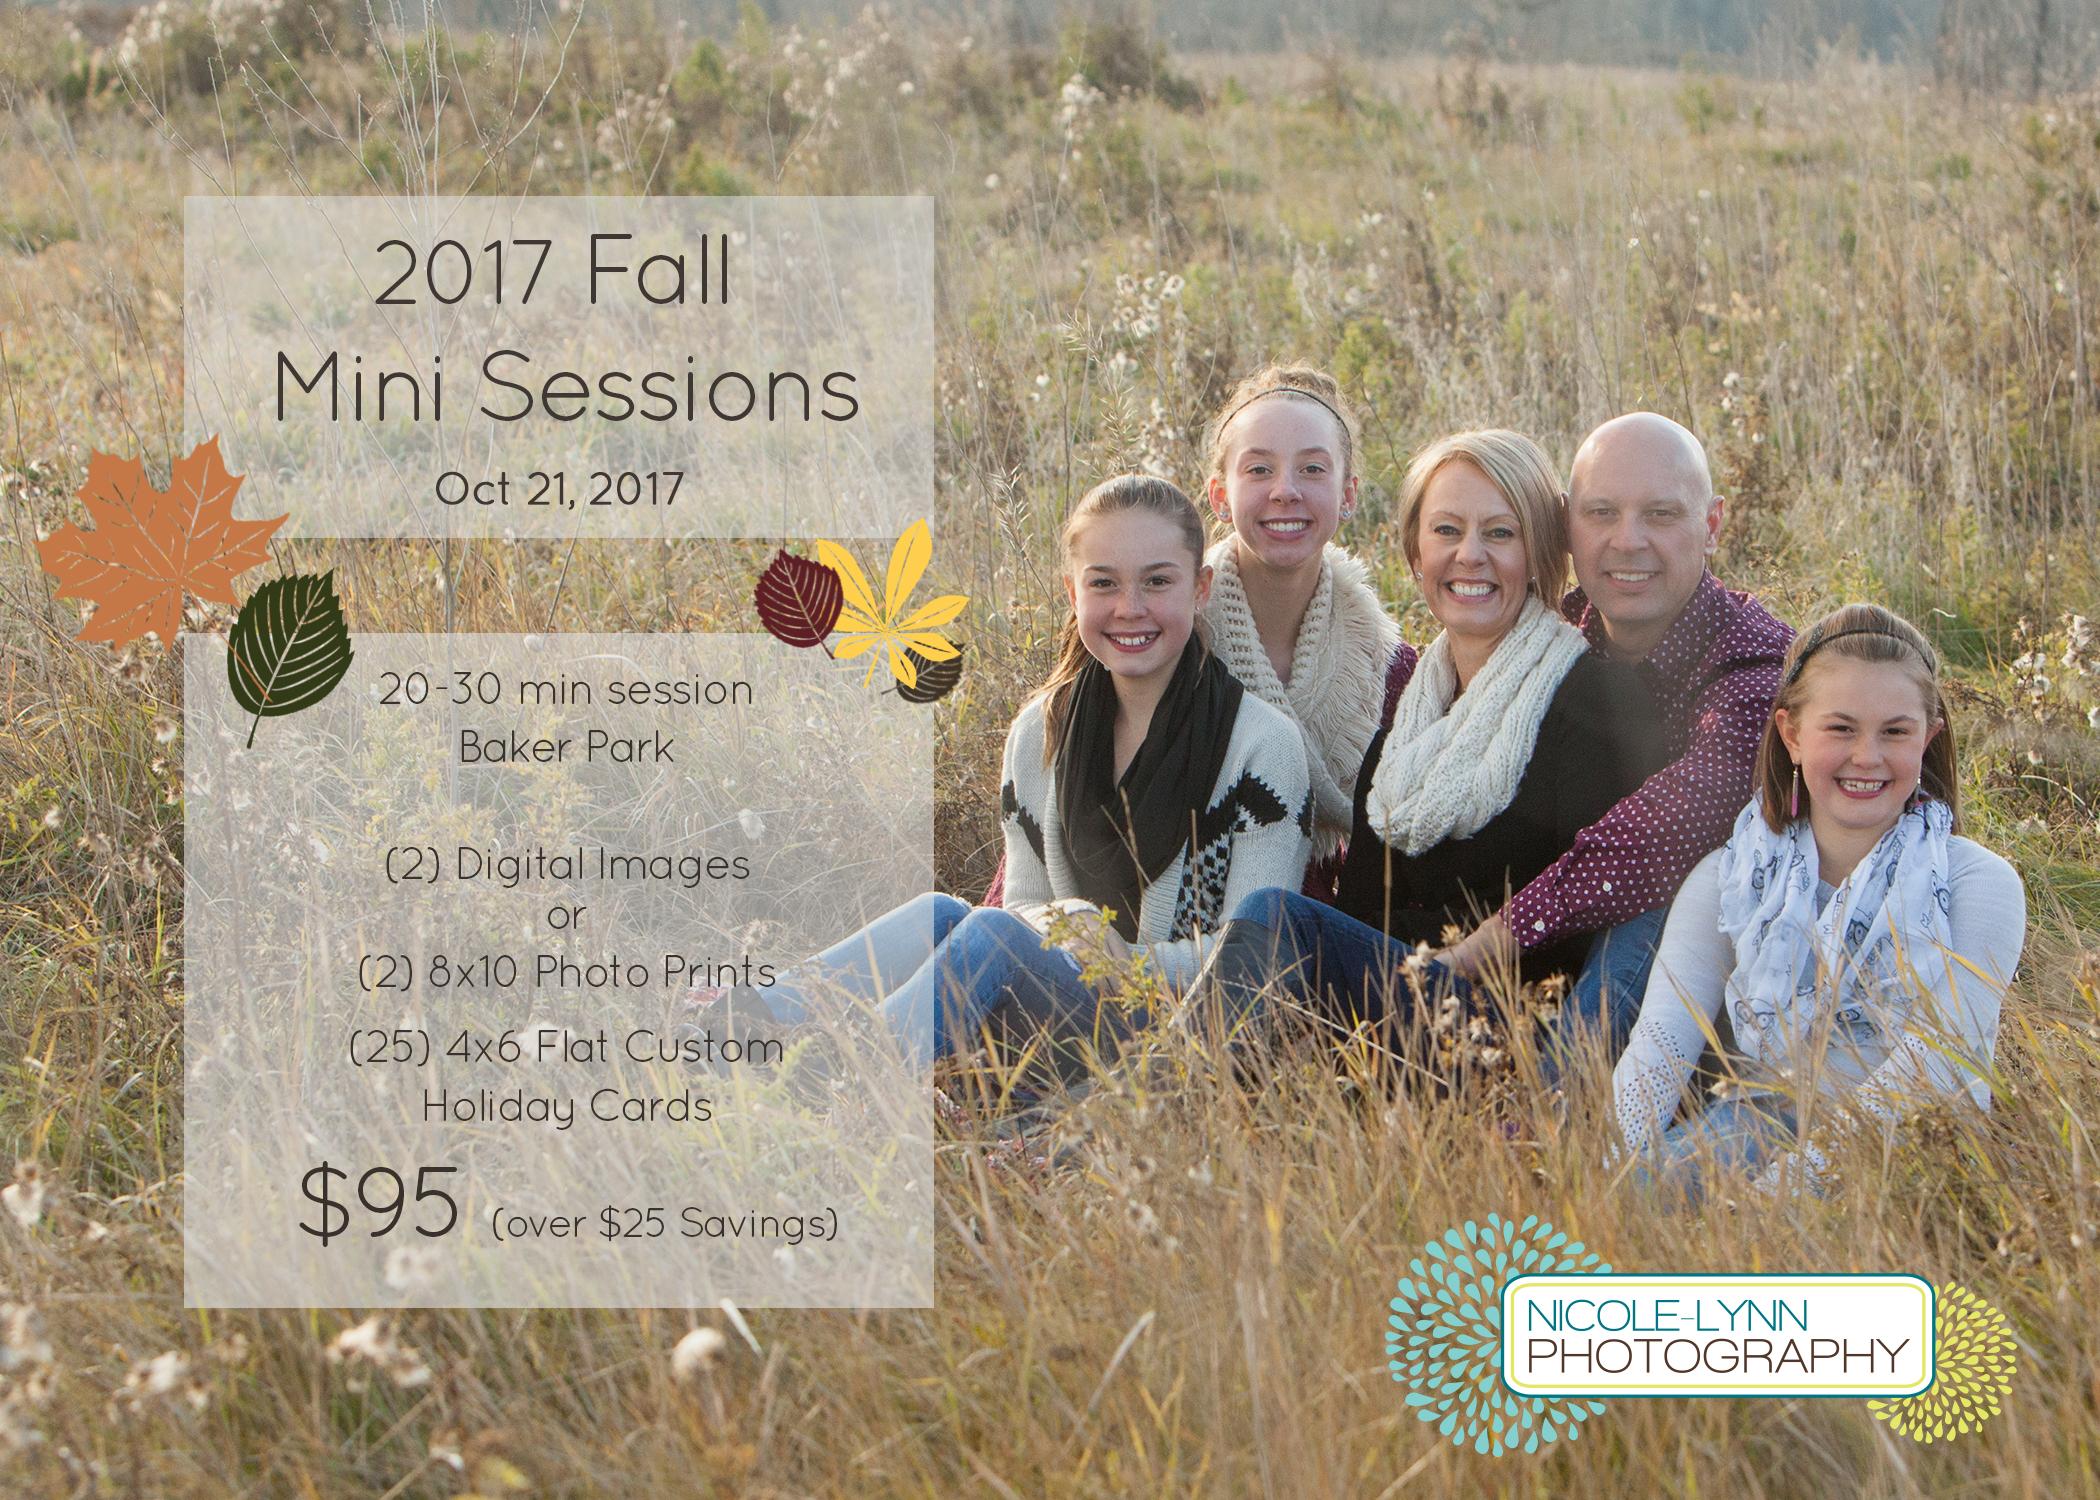 2017 Mini Fall Sessions (Oct 21)